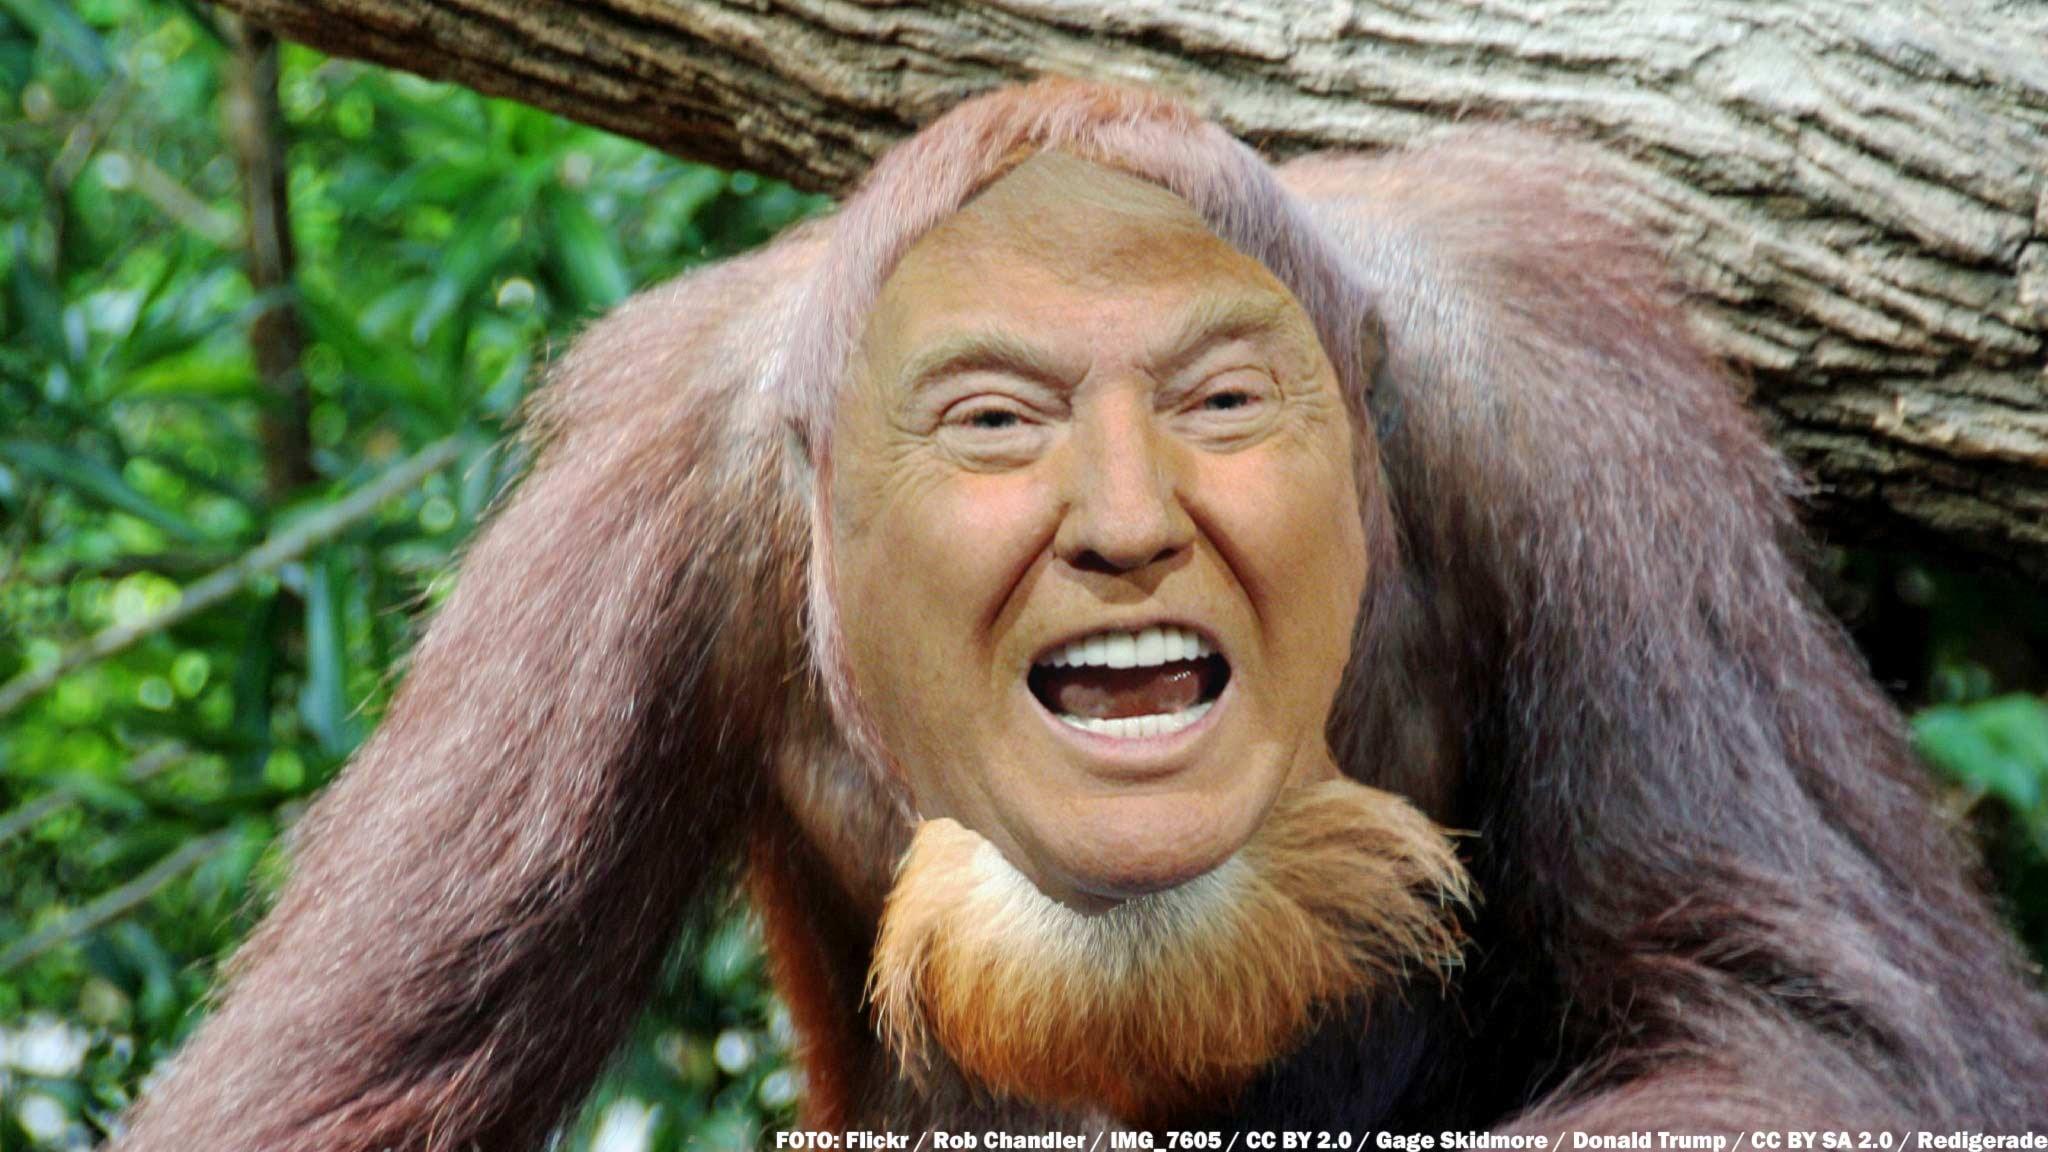 #24. Donald Trump